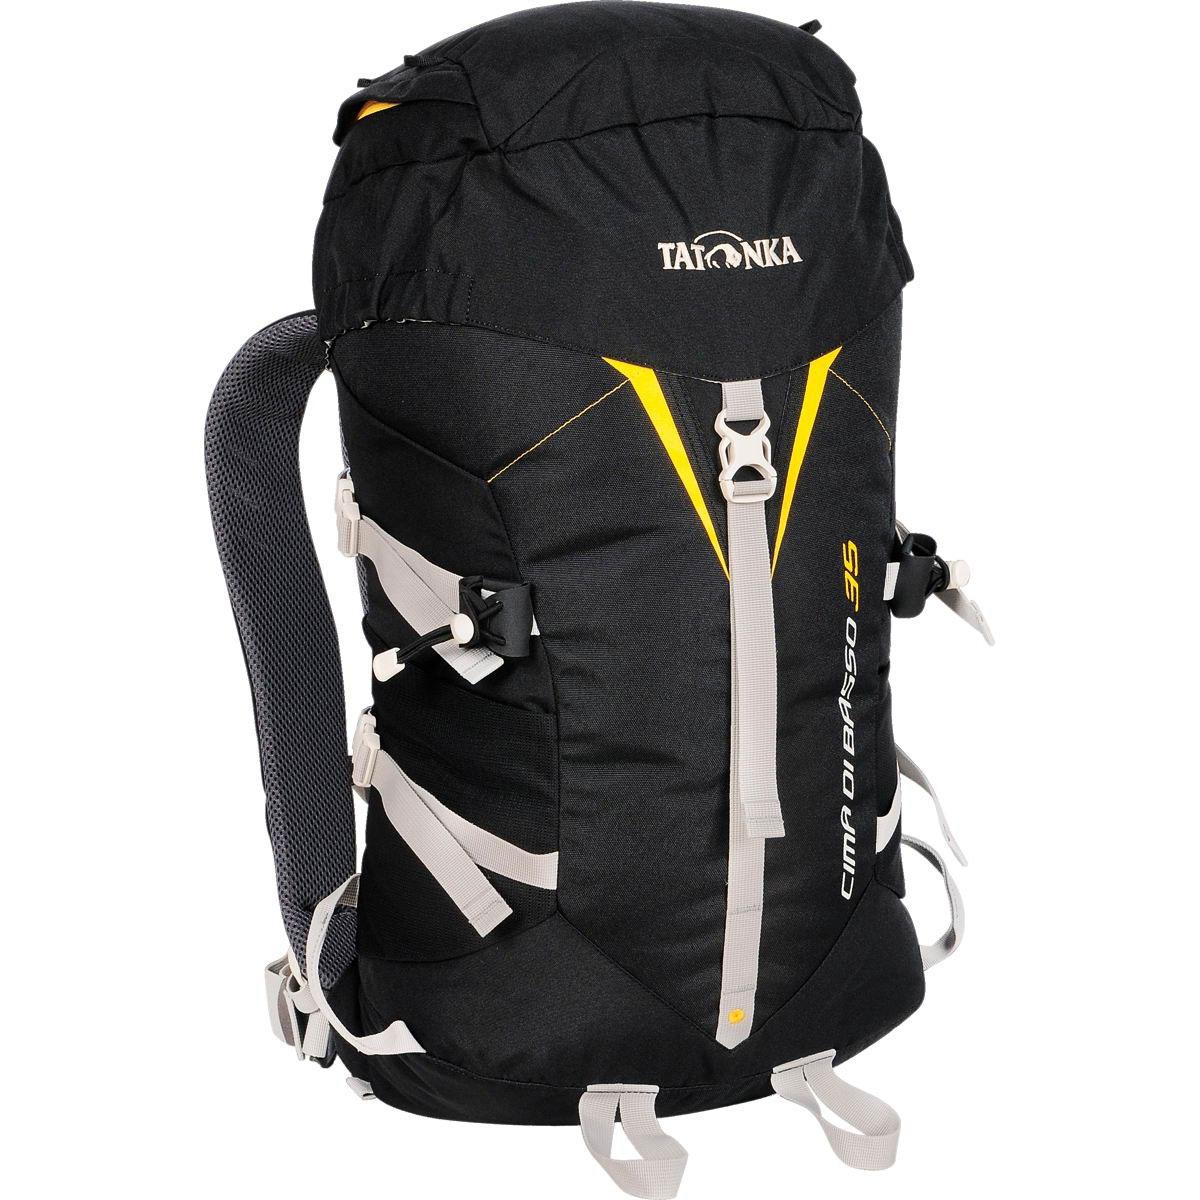 Рюкзак спортивный Tatonka  Cima Di Basso , цвет: черный, 35 л - Рюкзаки